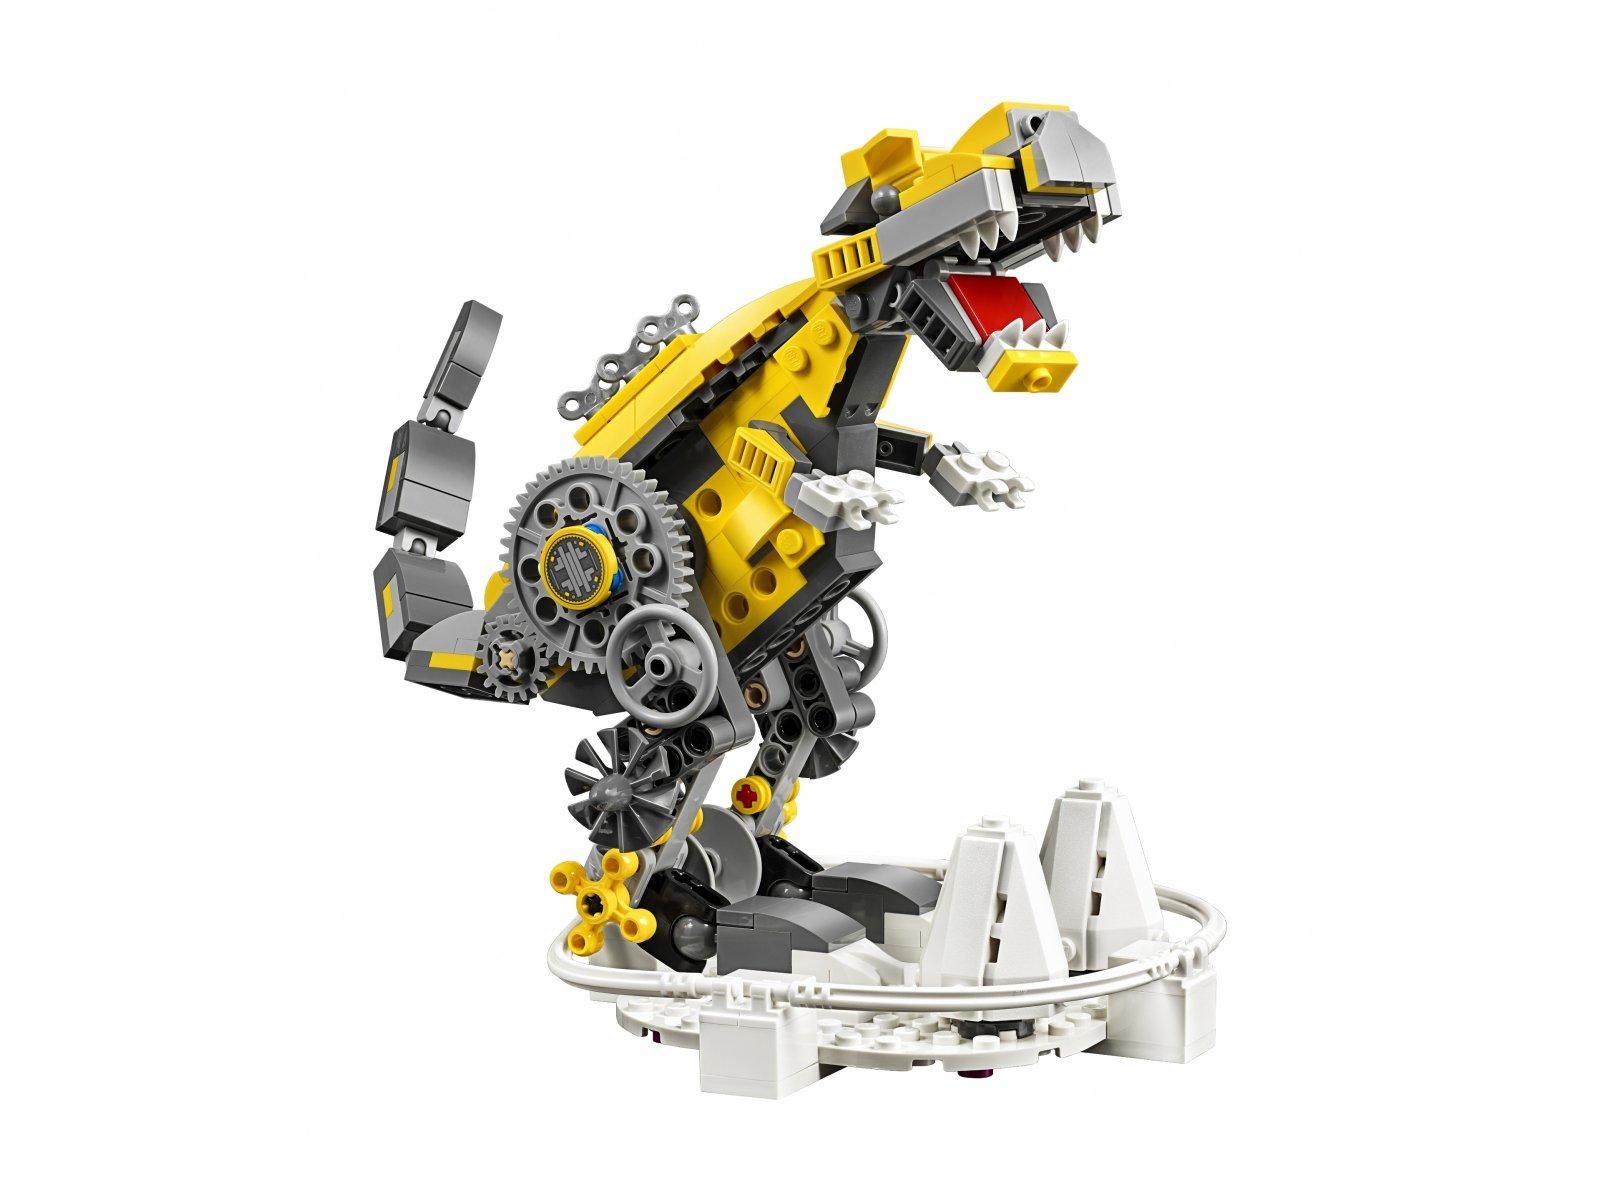 LEGO House 40366 Dinosaurs